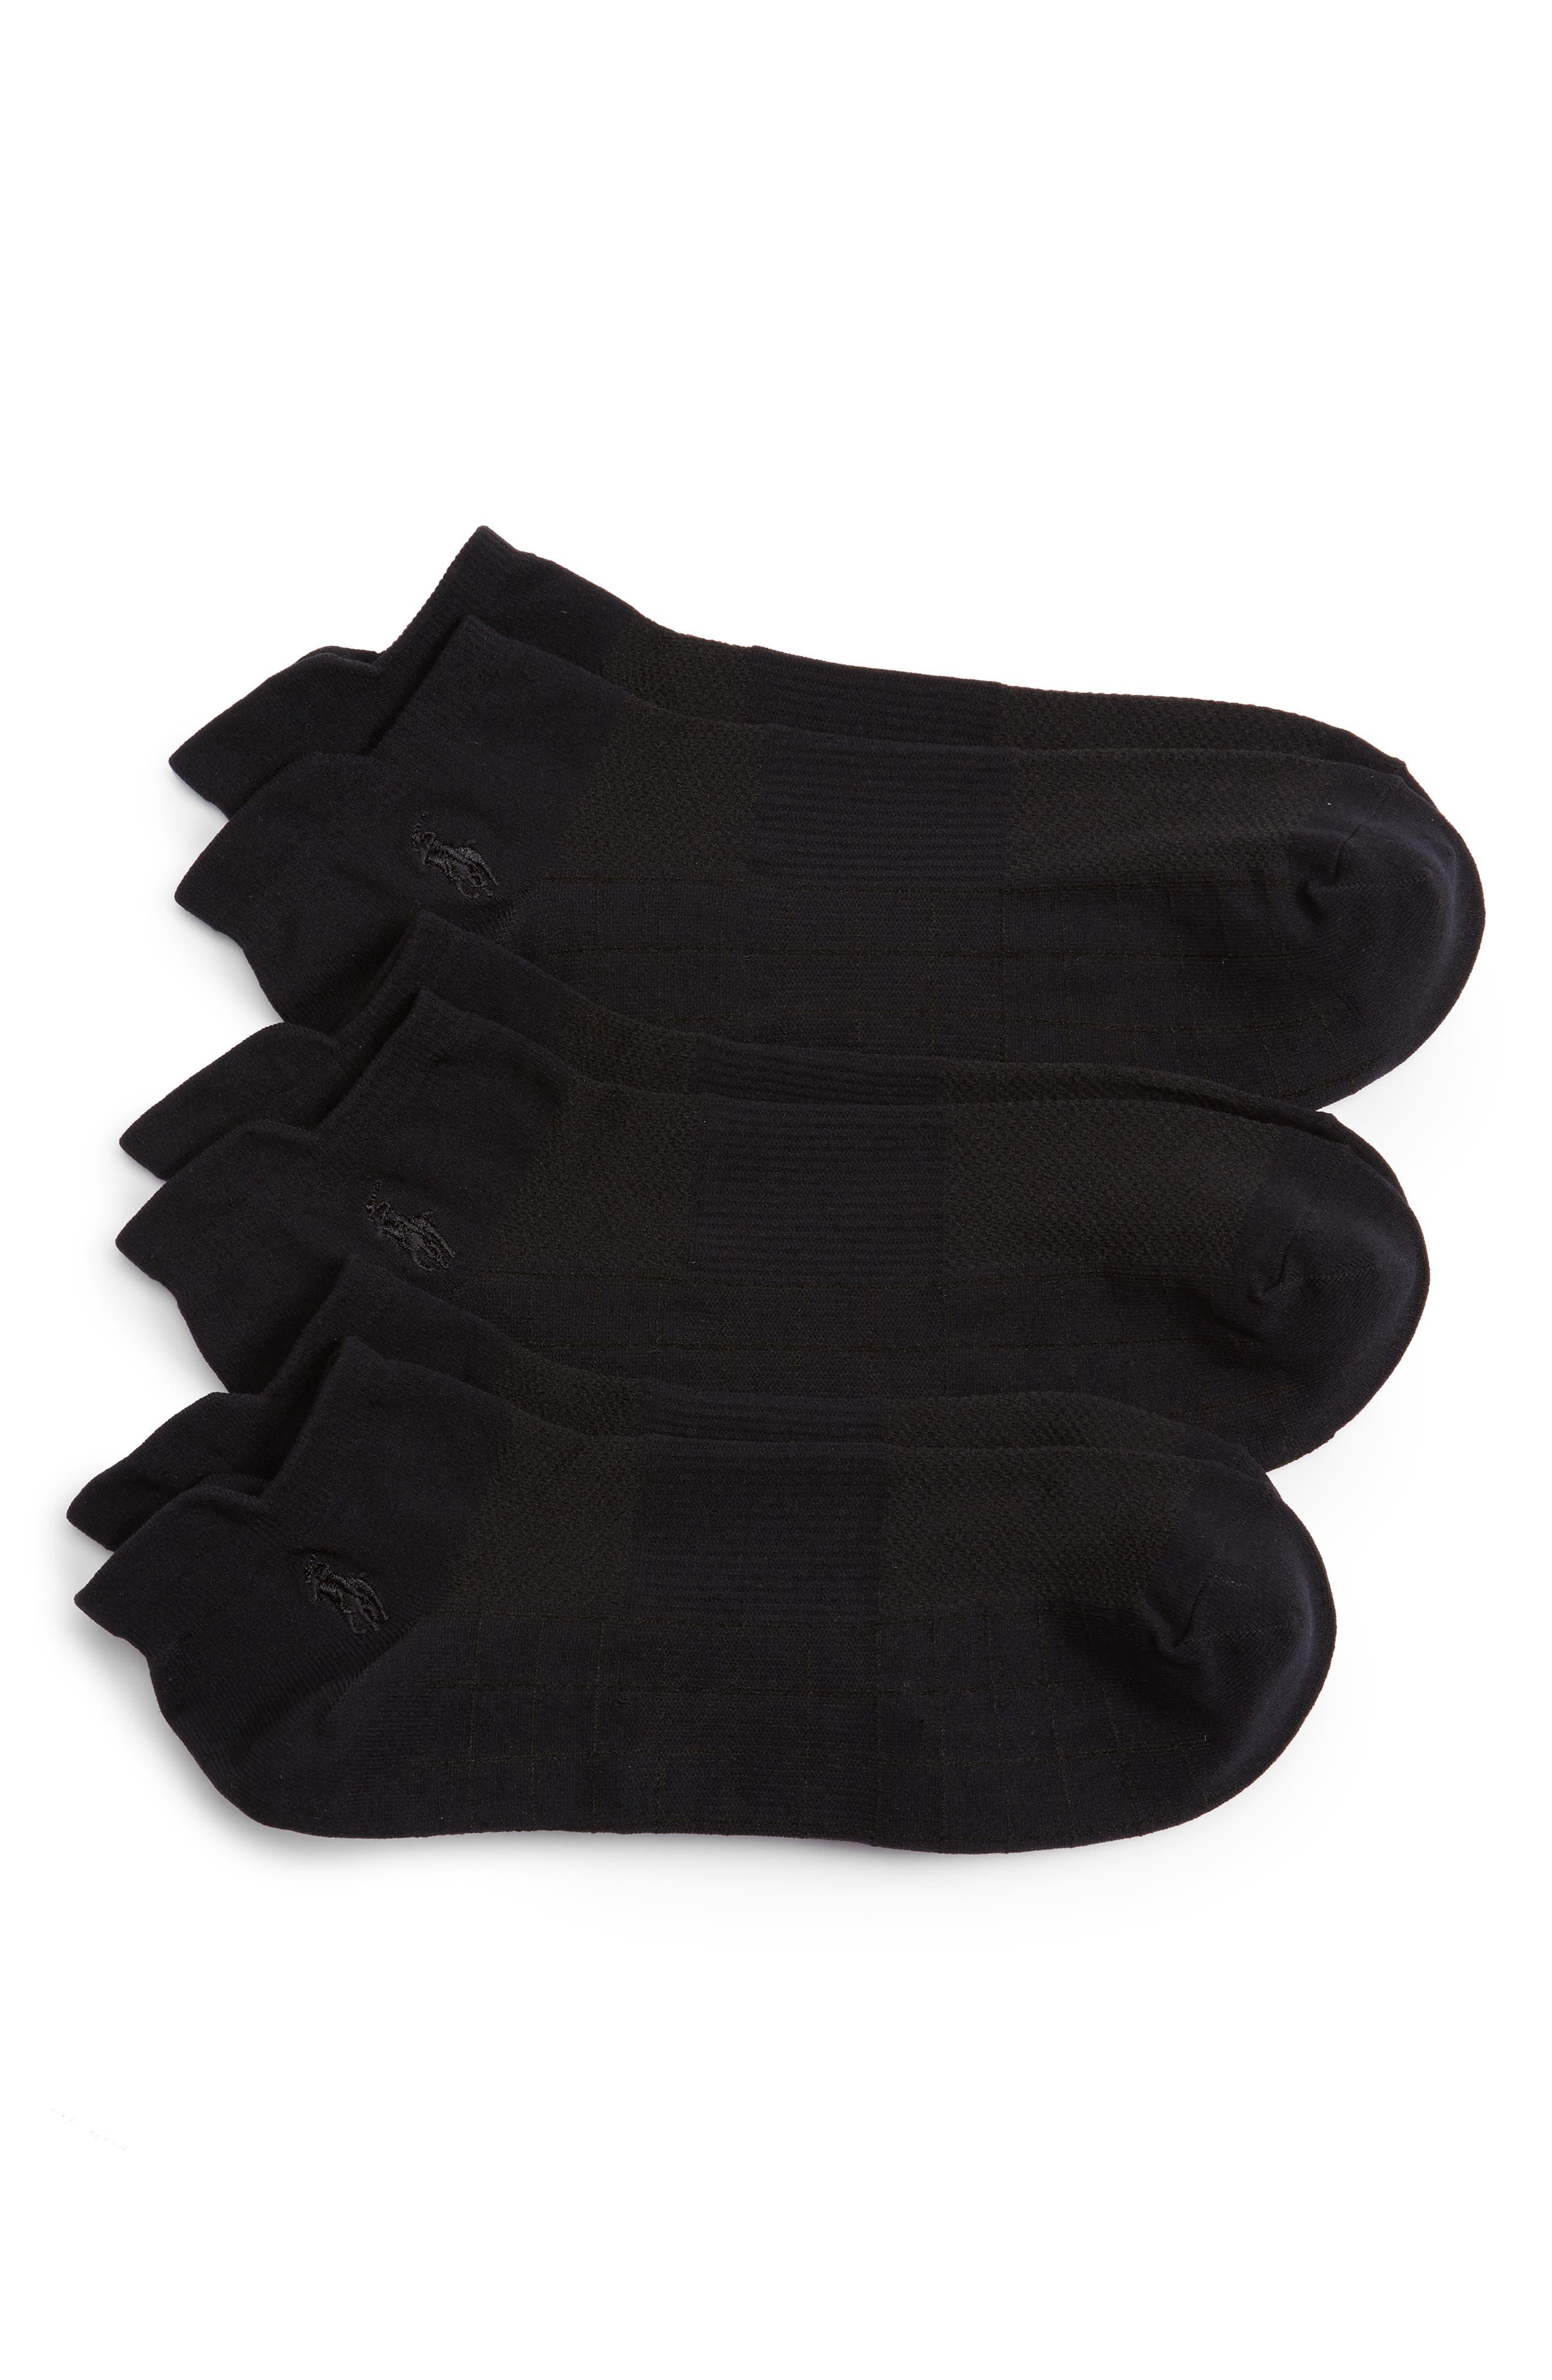 Polo Ralph Lauren 'Teach Ghost' Socks (Assorted 3-Pack)